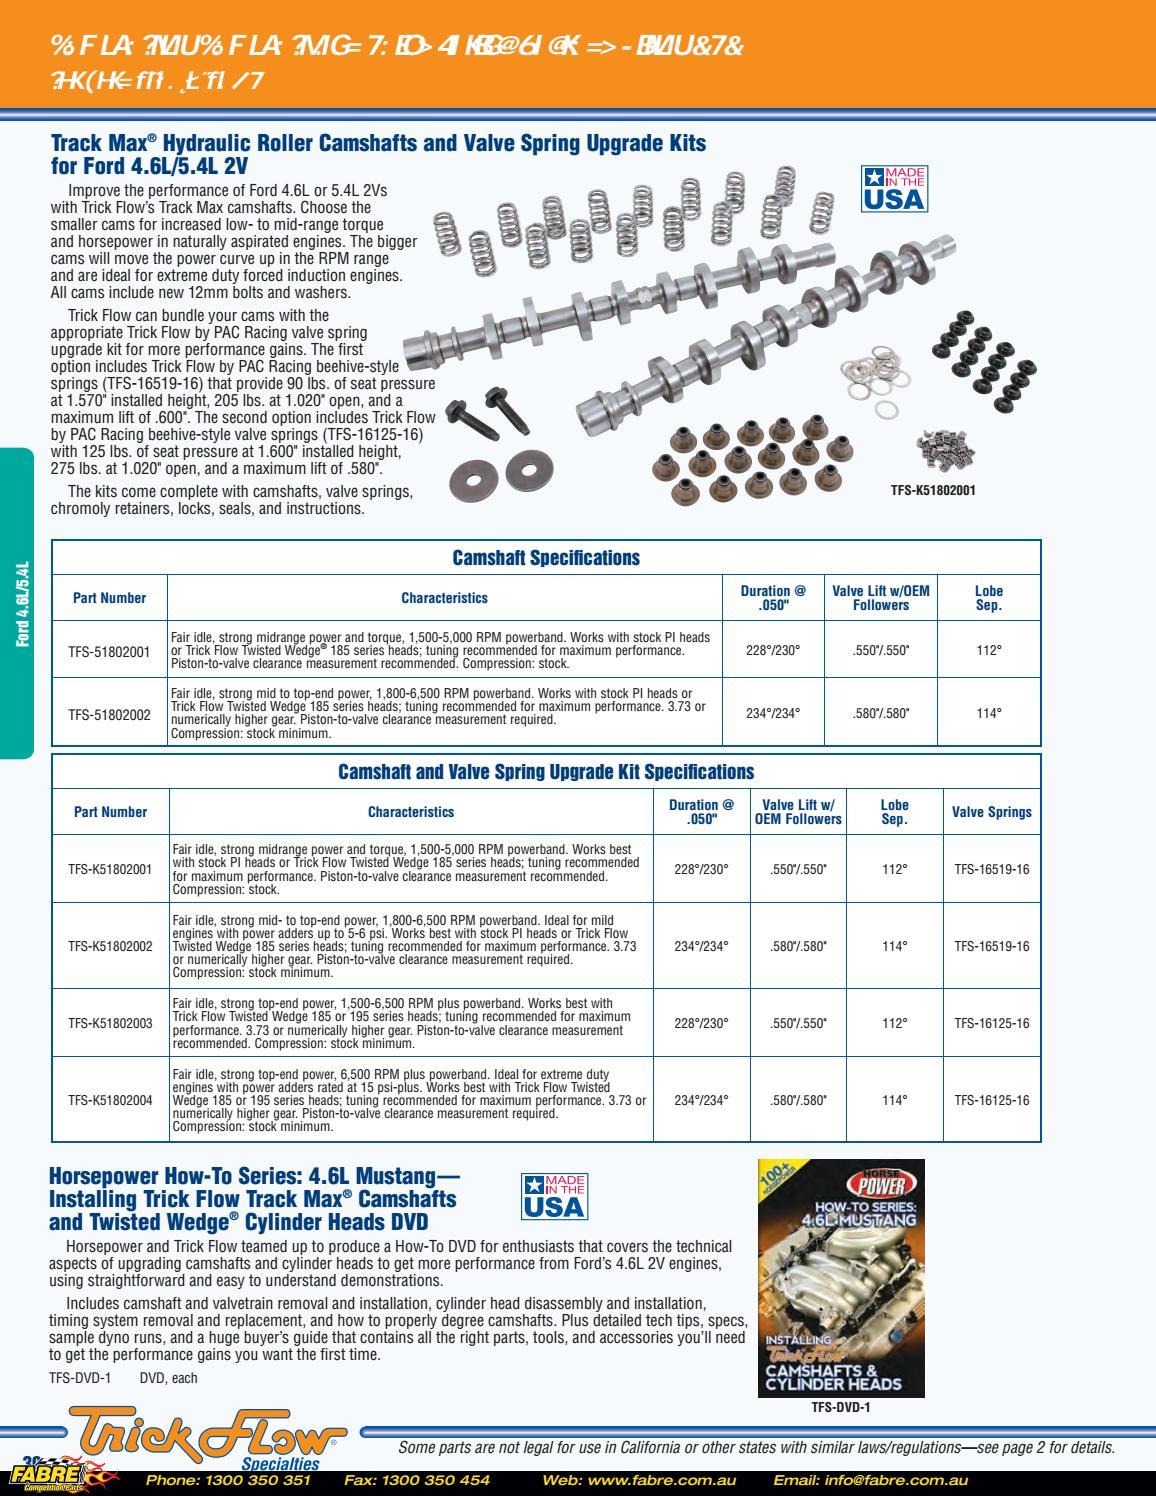 2016 Trick Flow Catalog by Fabre Australia - issuu